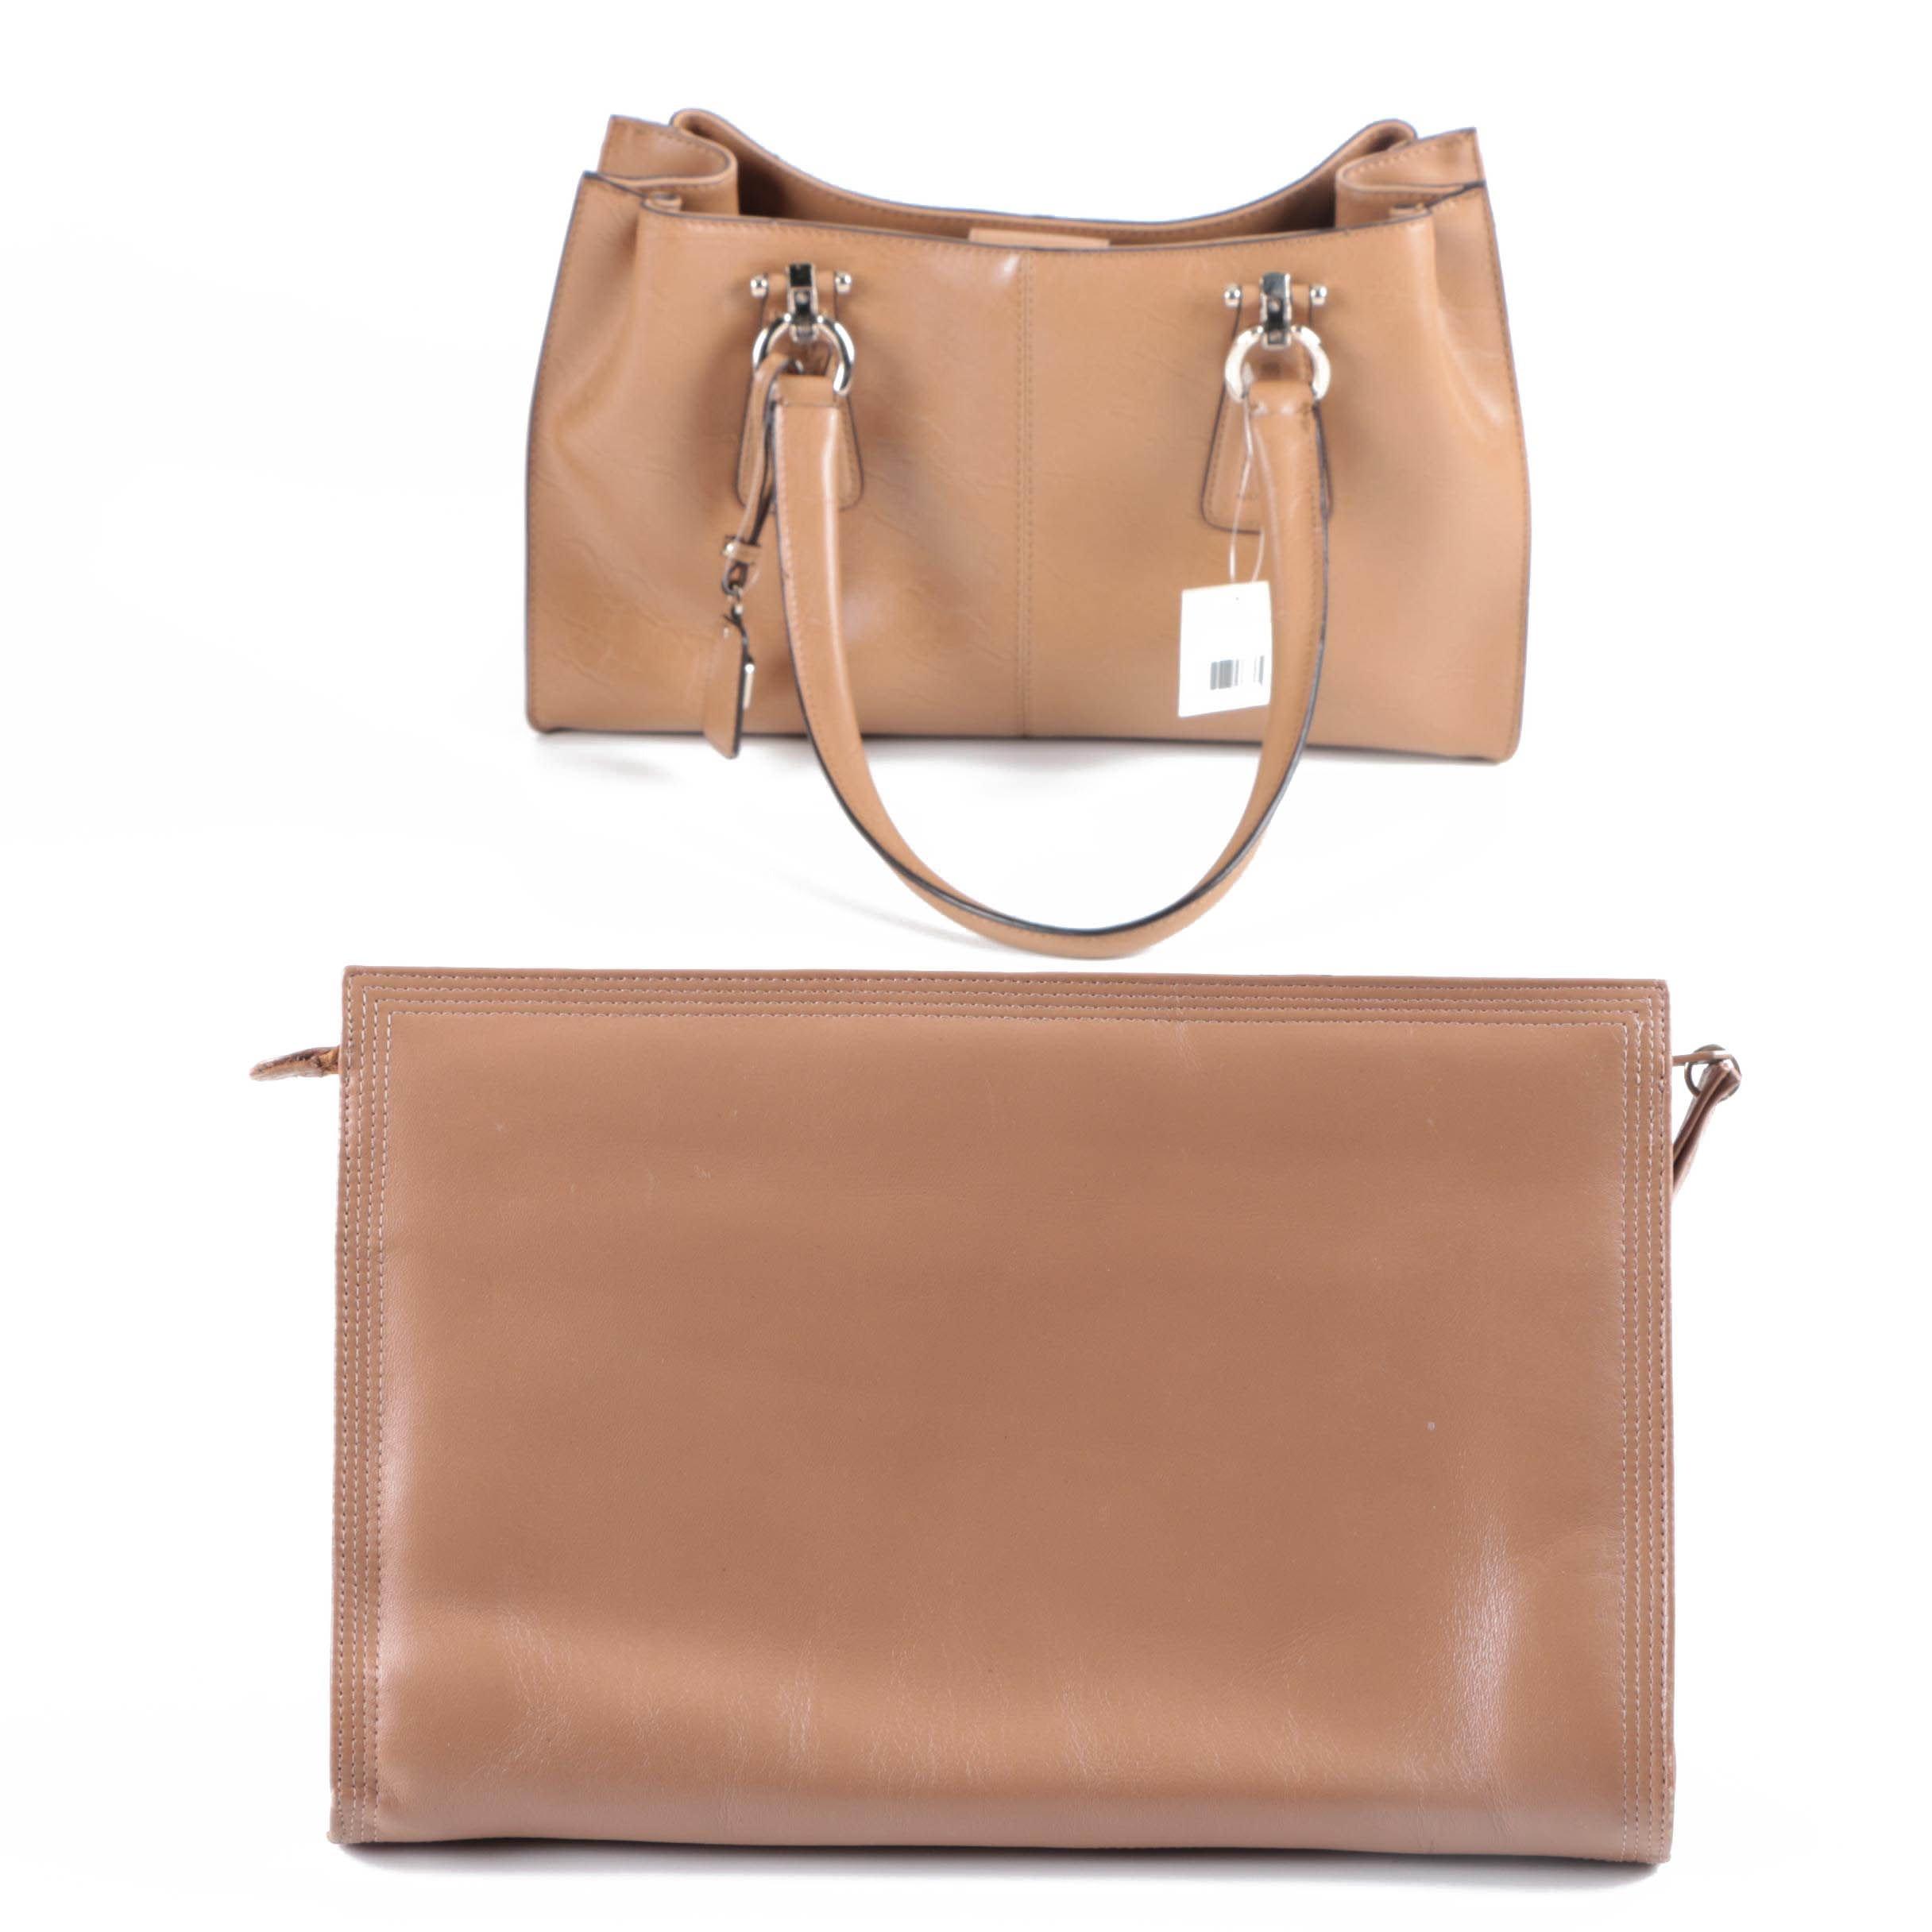 Leather Handbags Including Liz Claiborne